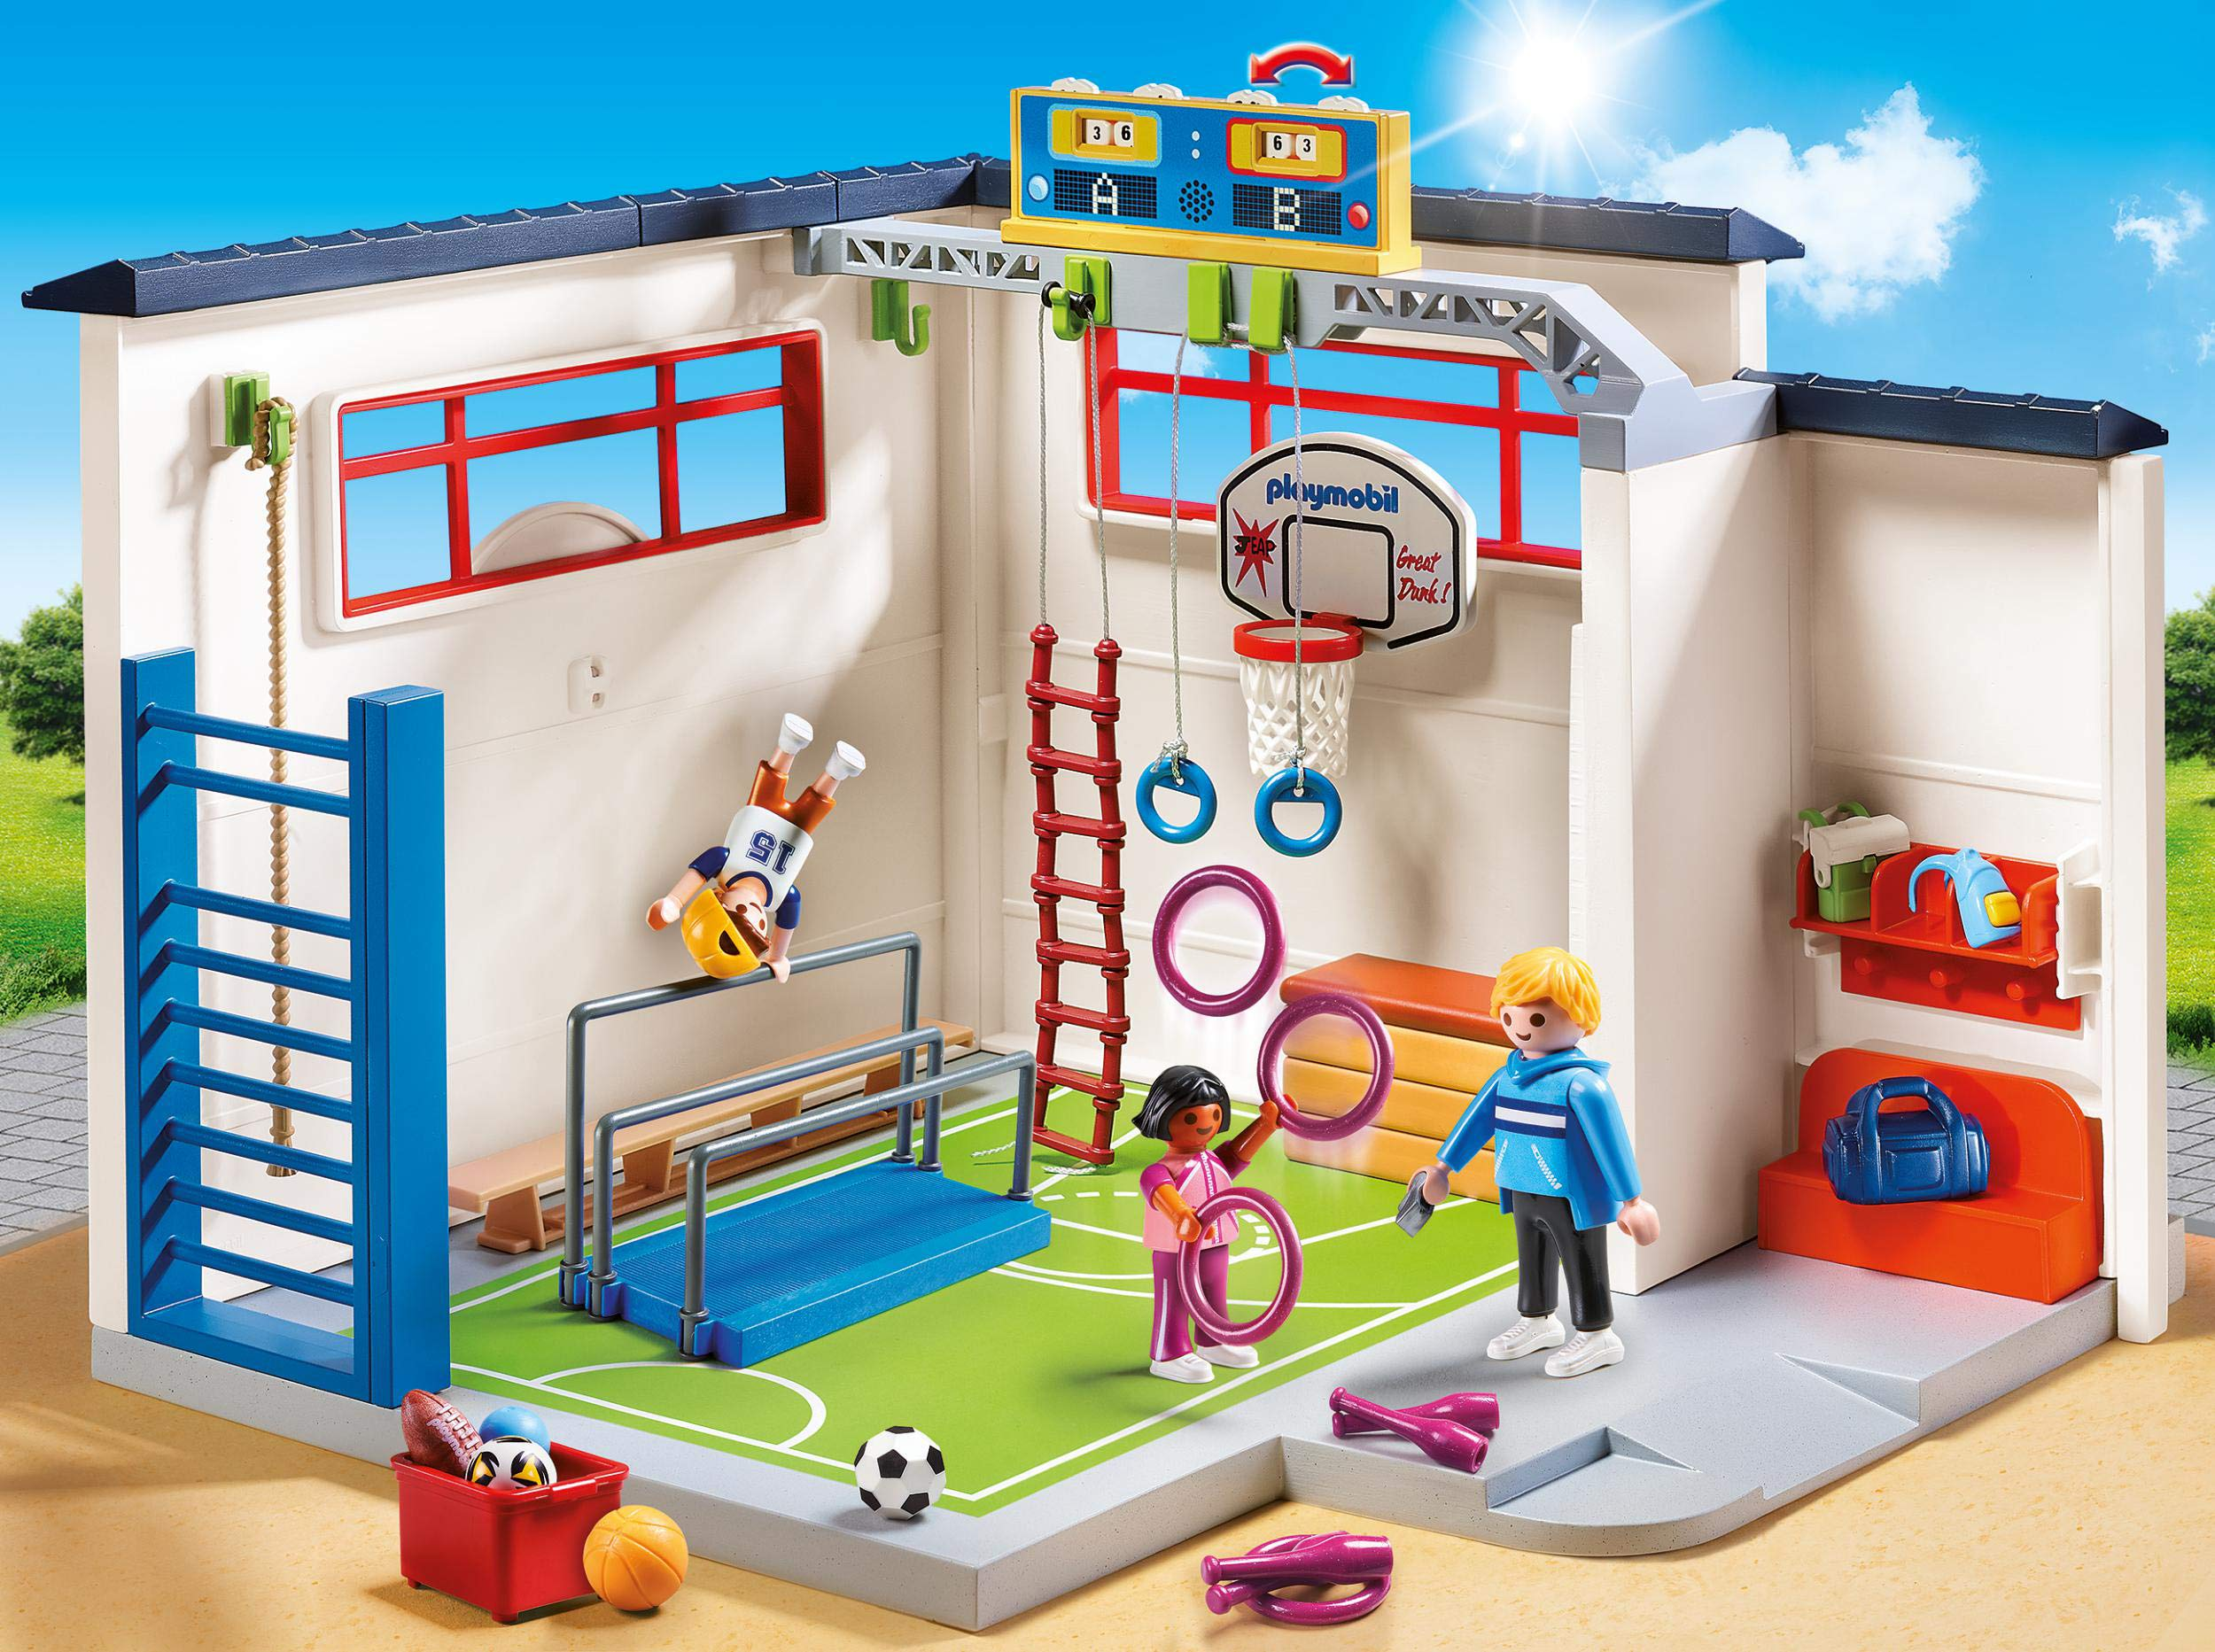 PLAYMOBIL® Gym Building Set by PLAYMOBIL® (Image #3)